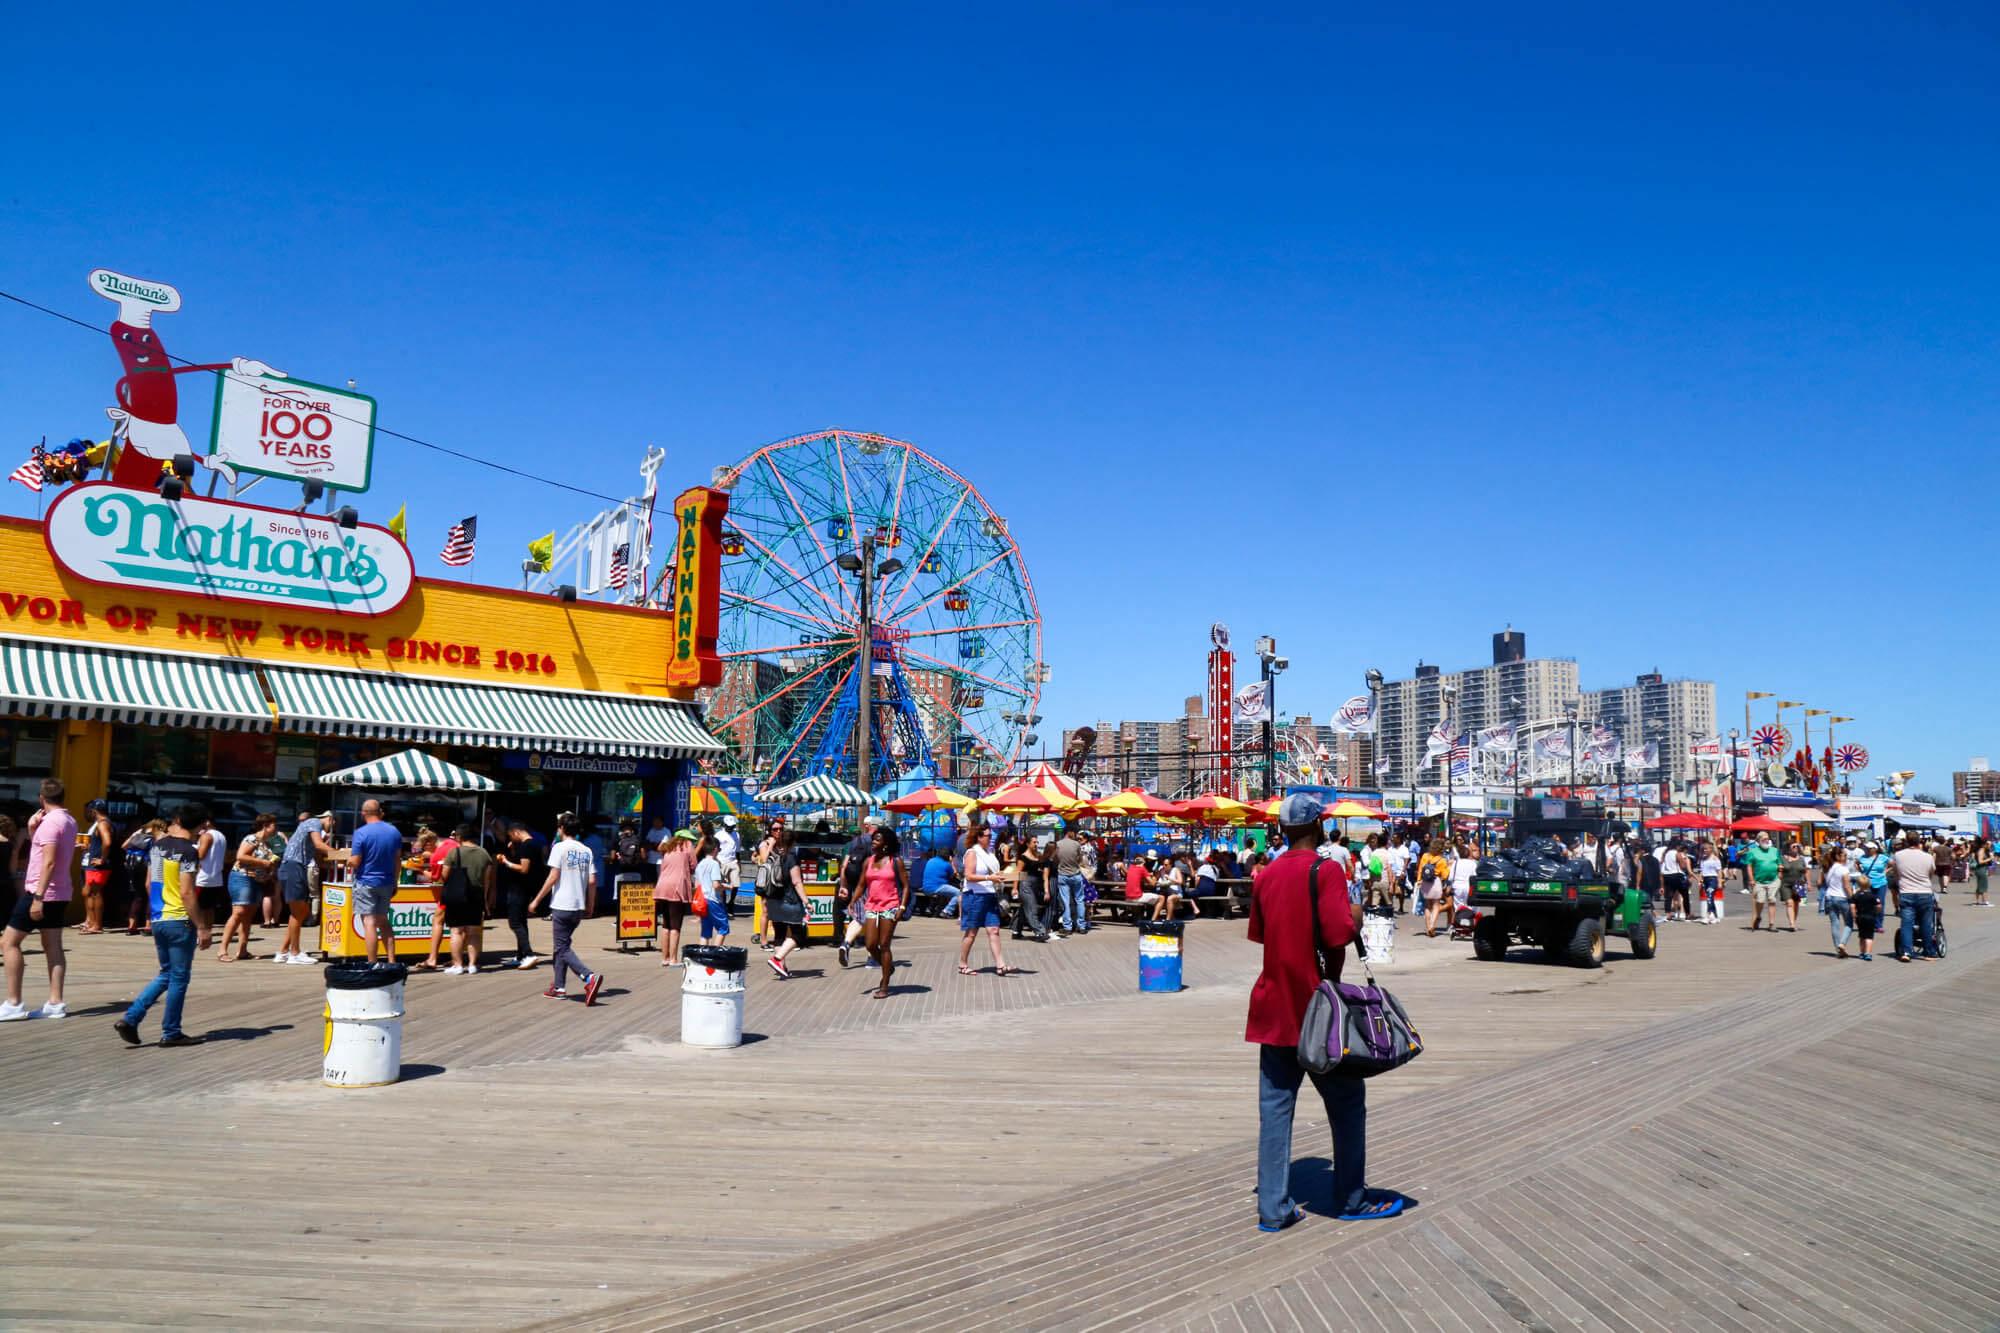 coney-island.jpg